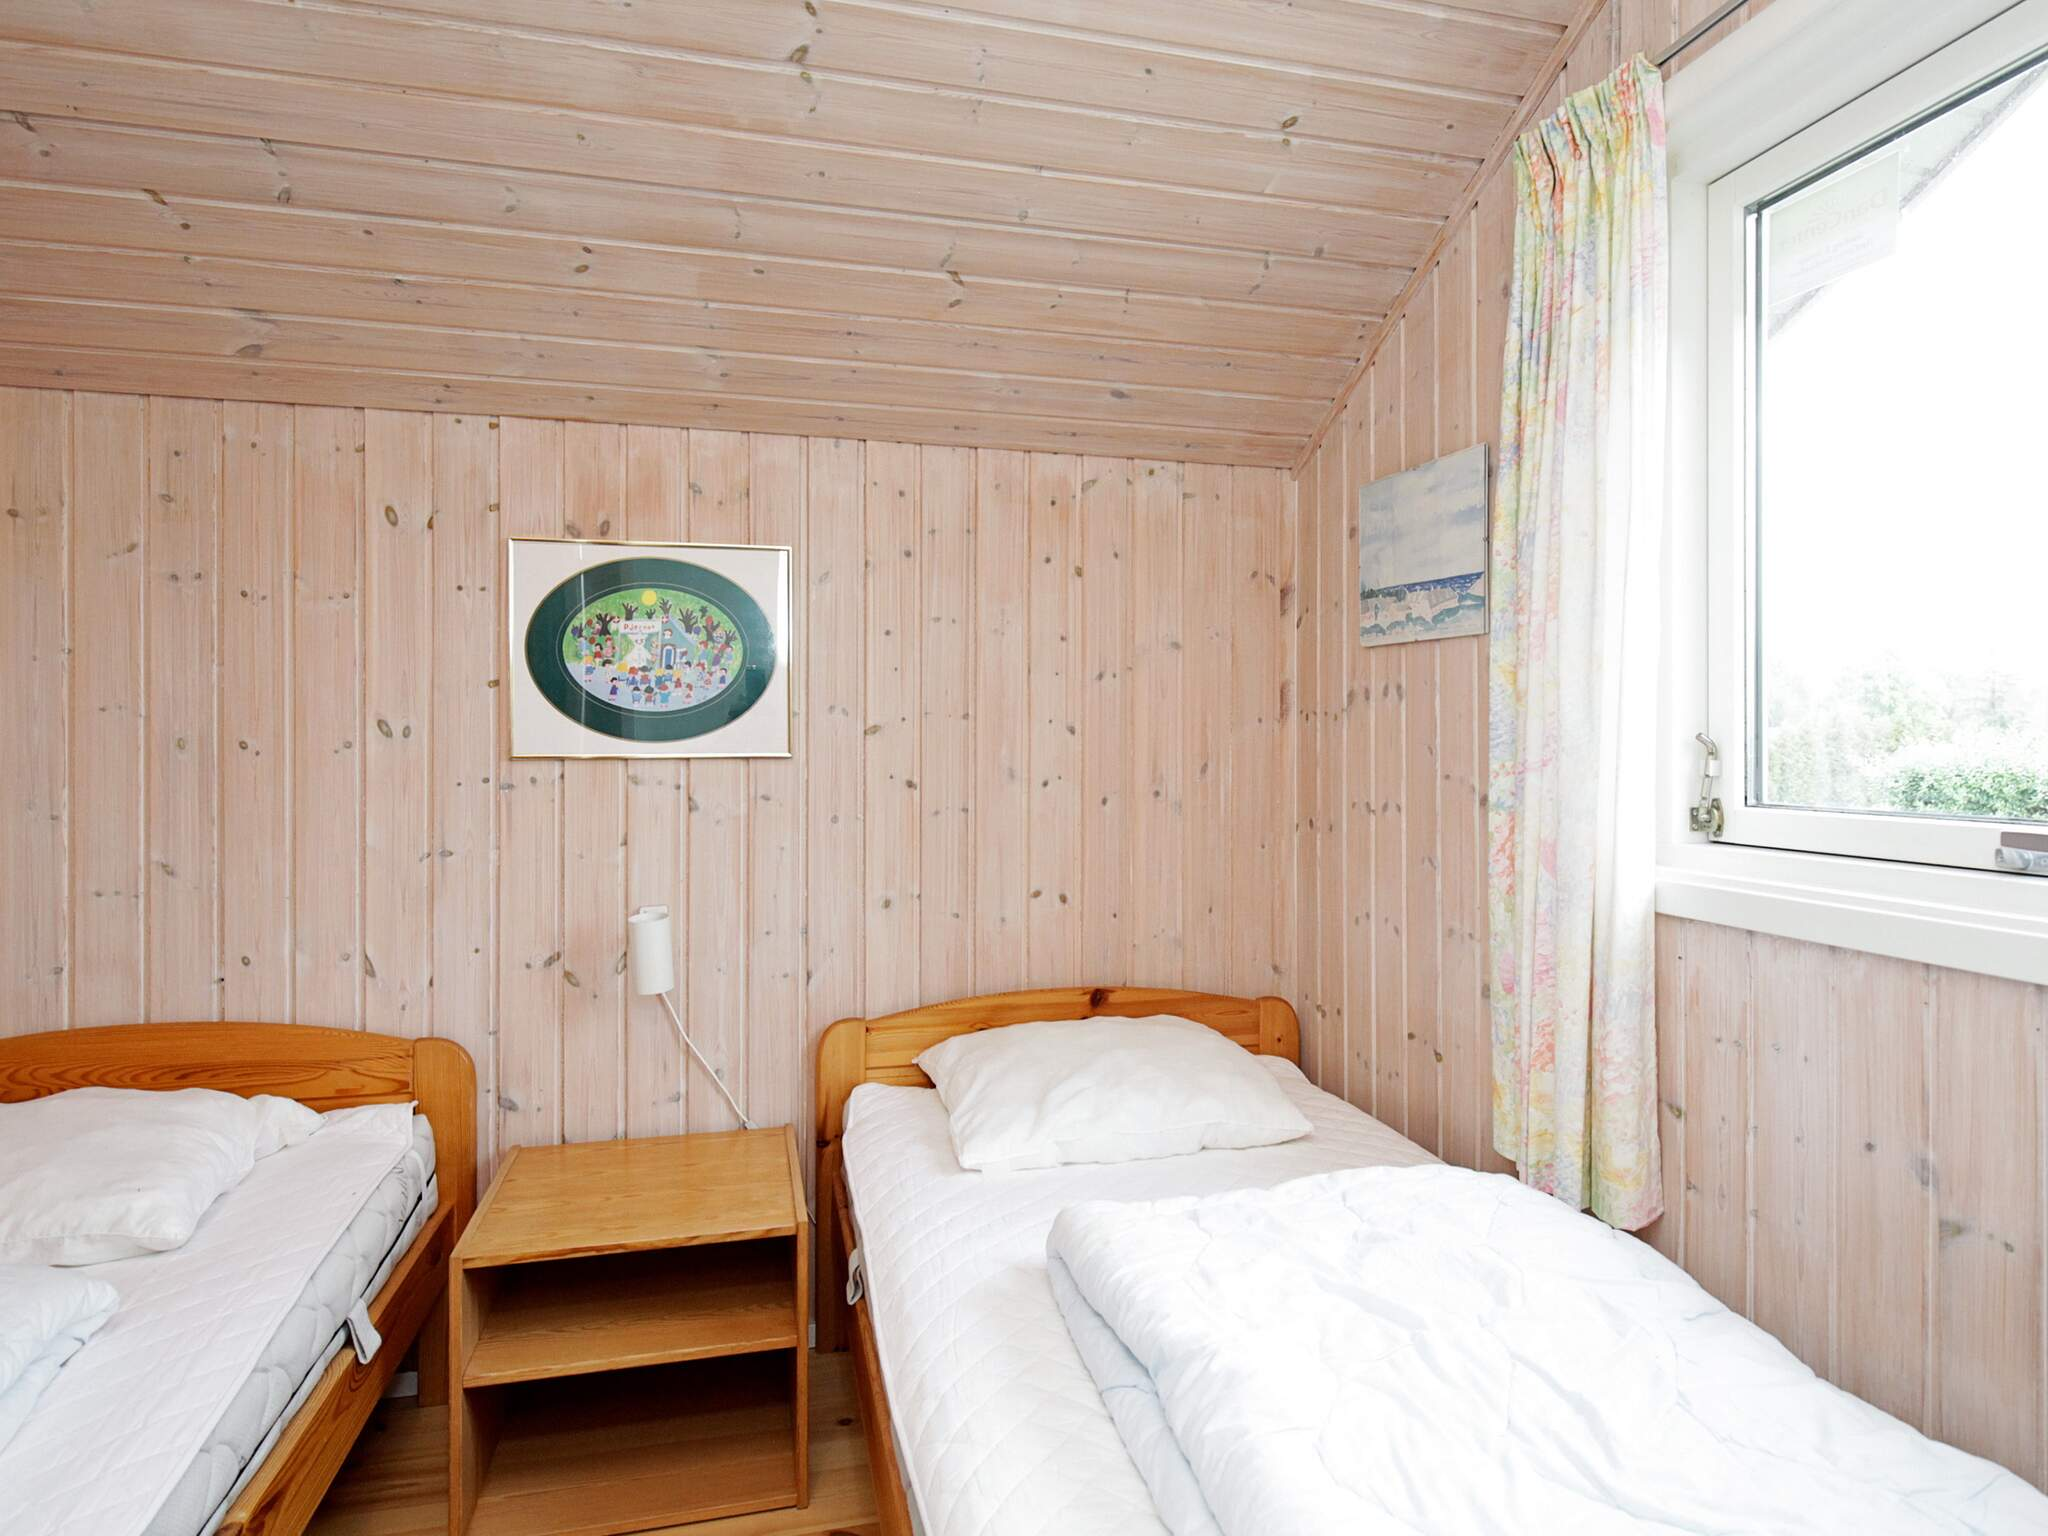 Ferienhaus Hyllingeriis (619896), Skibby, , Nordseeland, Dänemark, Bild 4